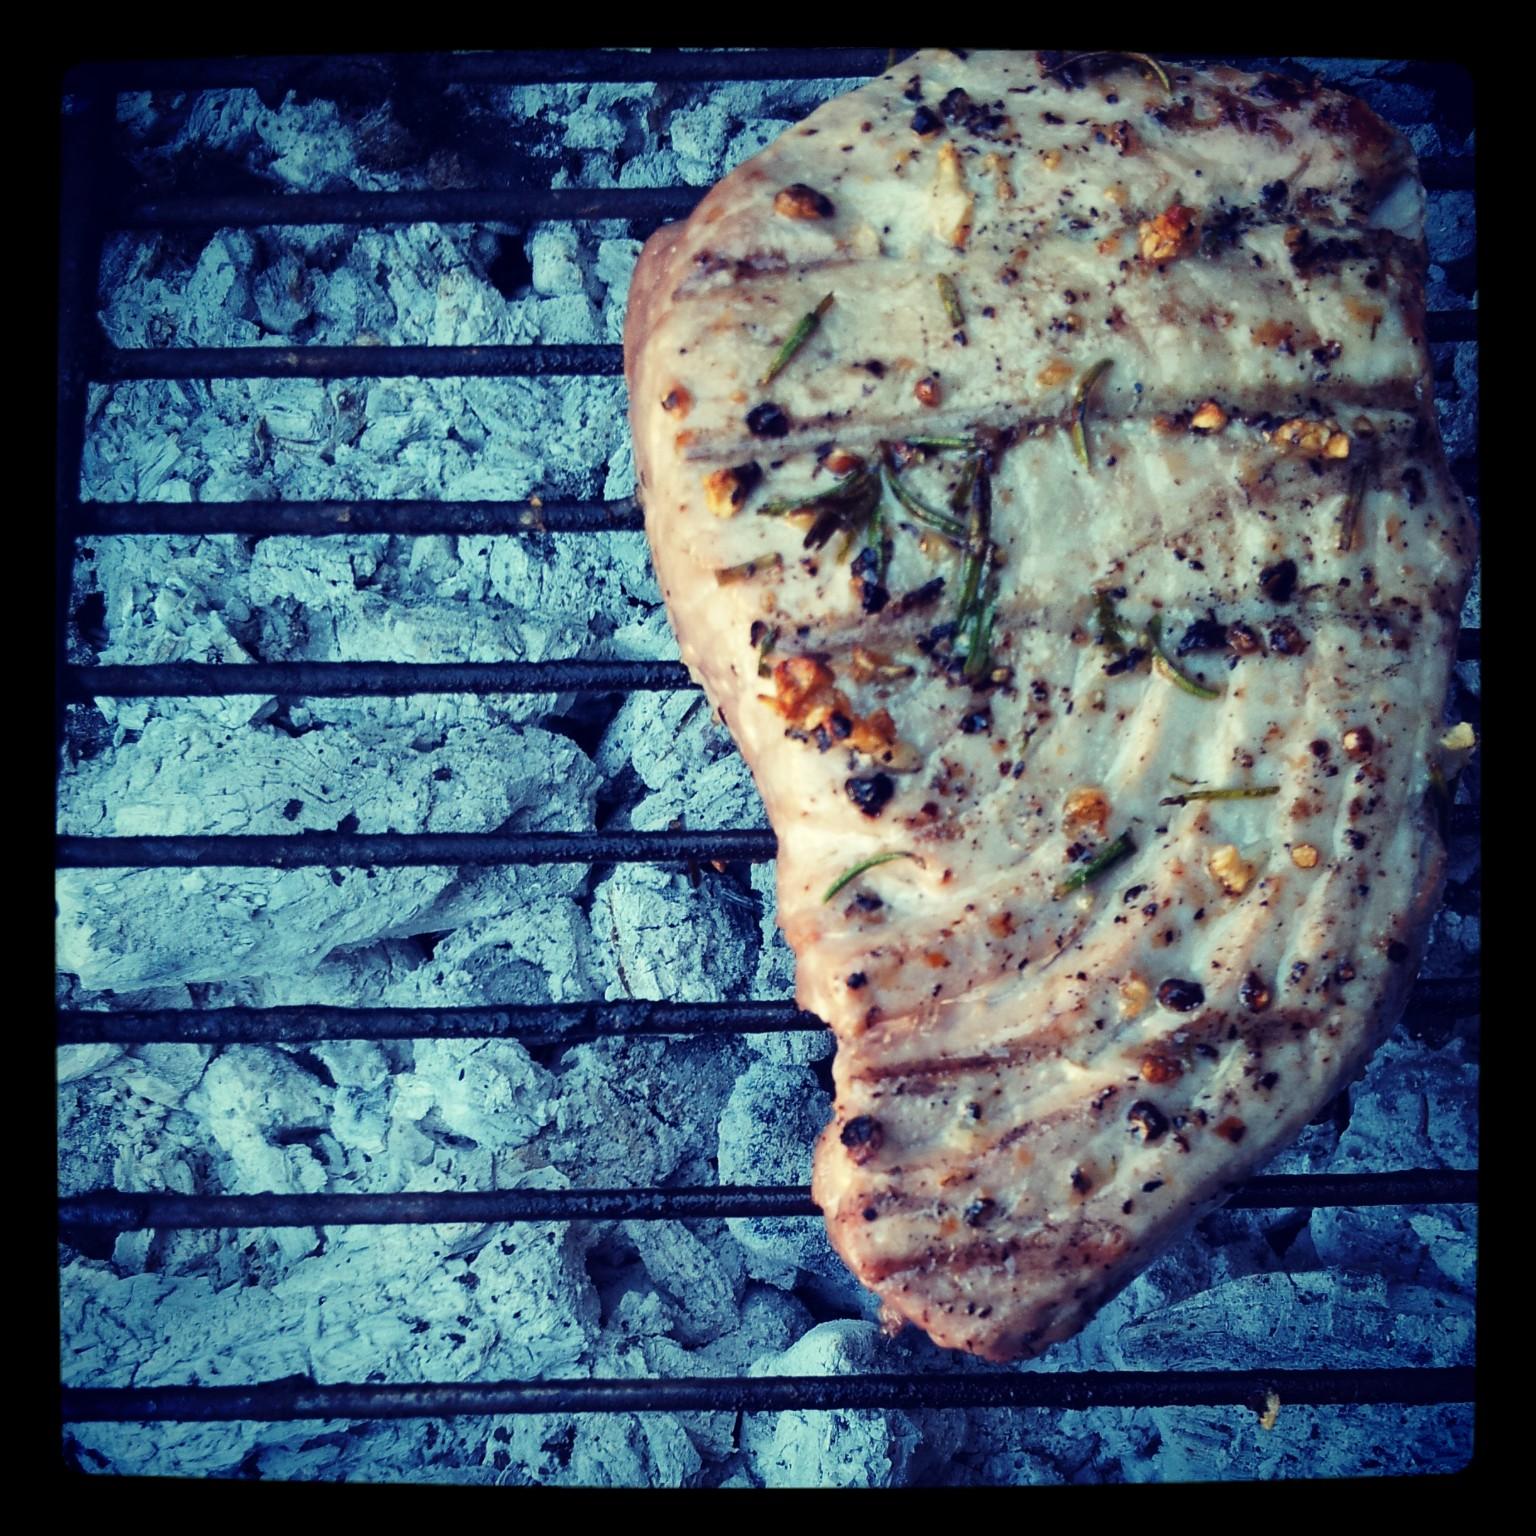 Char grilled Tuna Steak